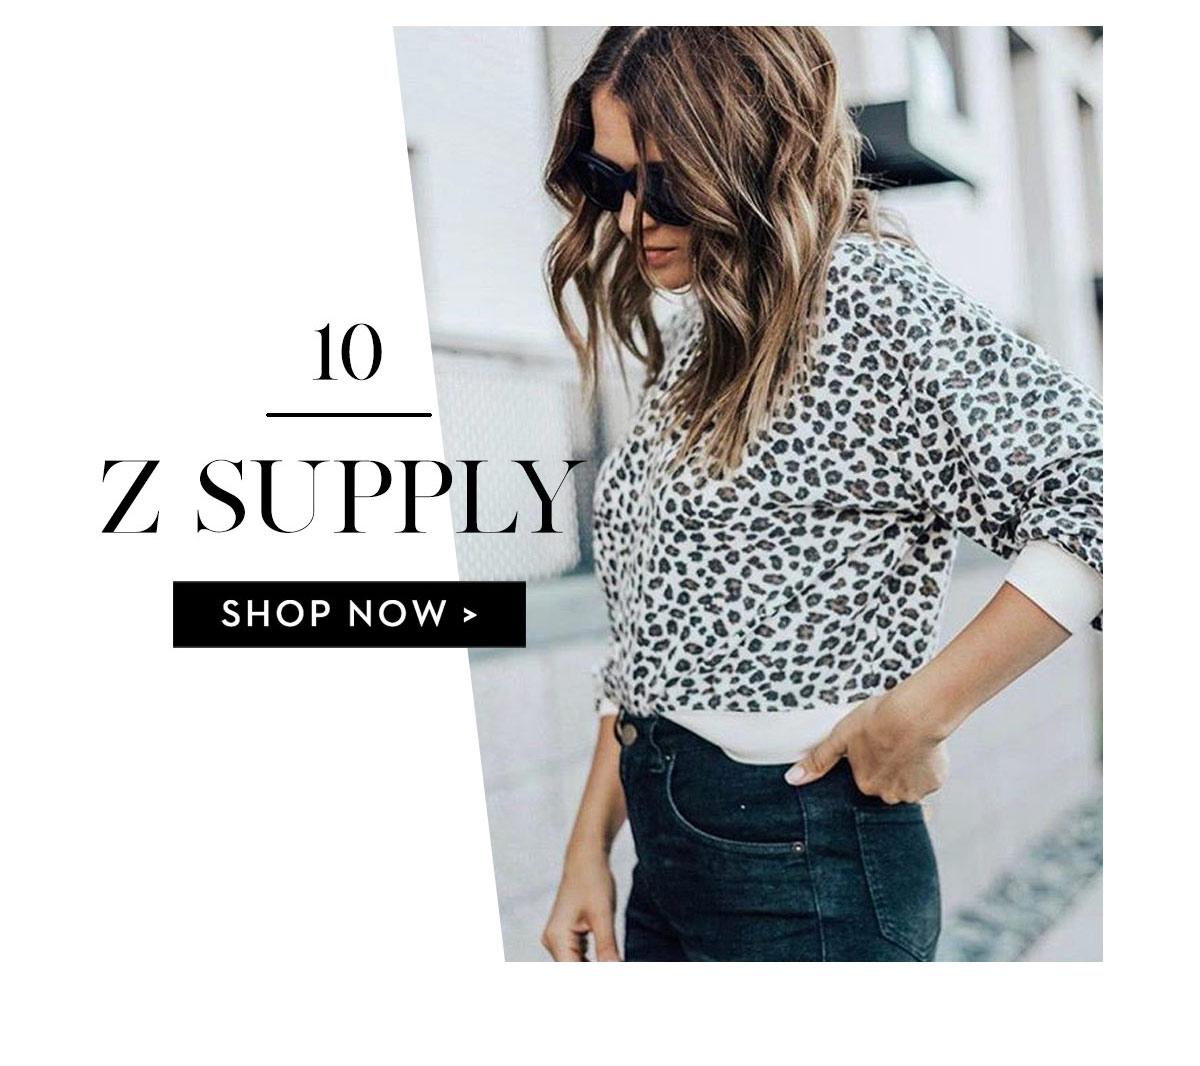 Shop Z Supply